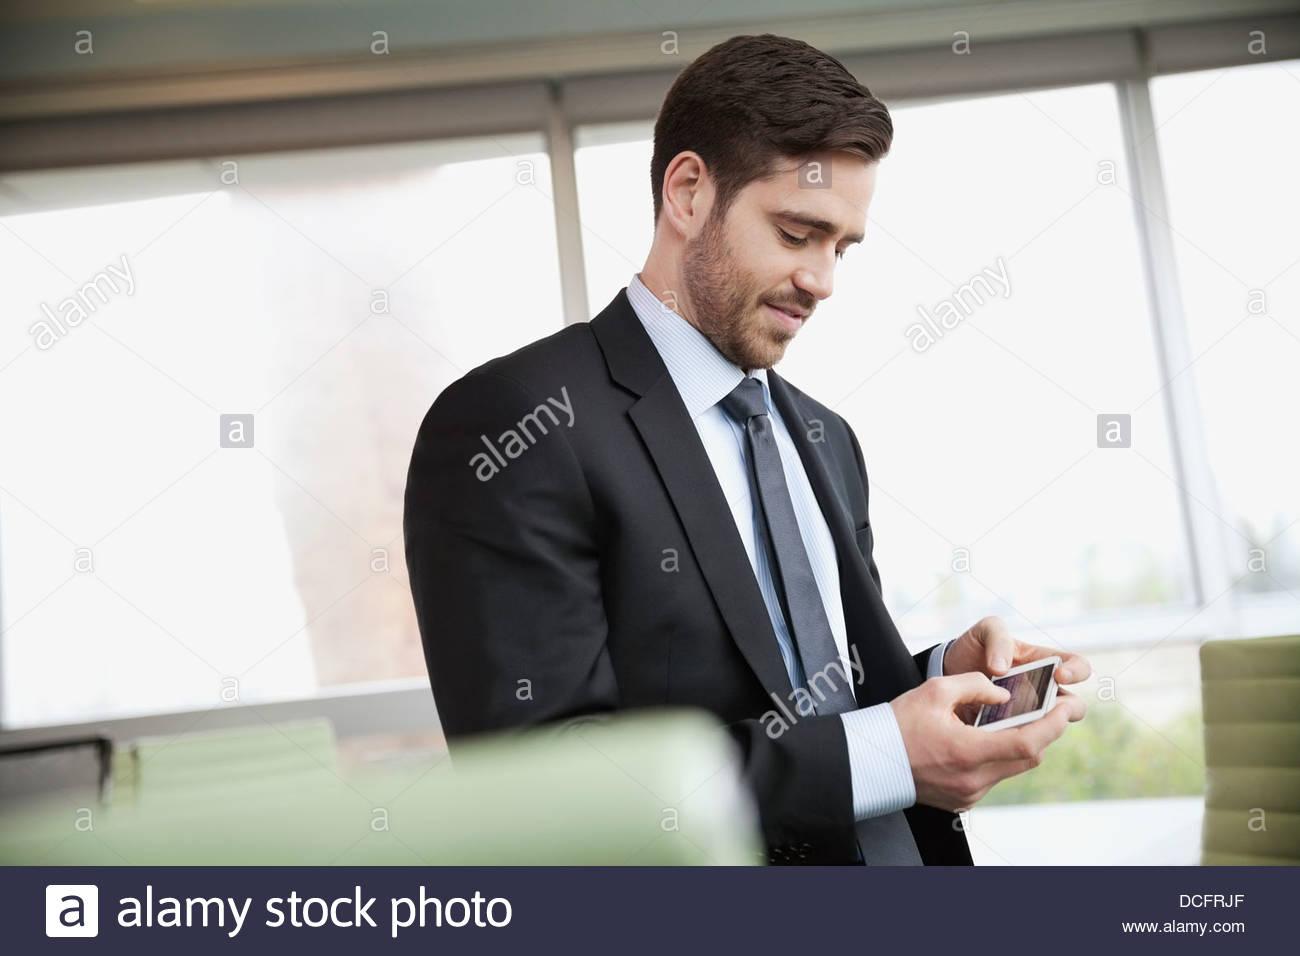 Empresario texting en teléfonos inteligentes. Imagen De Stock